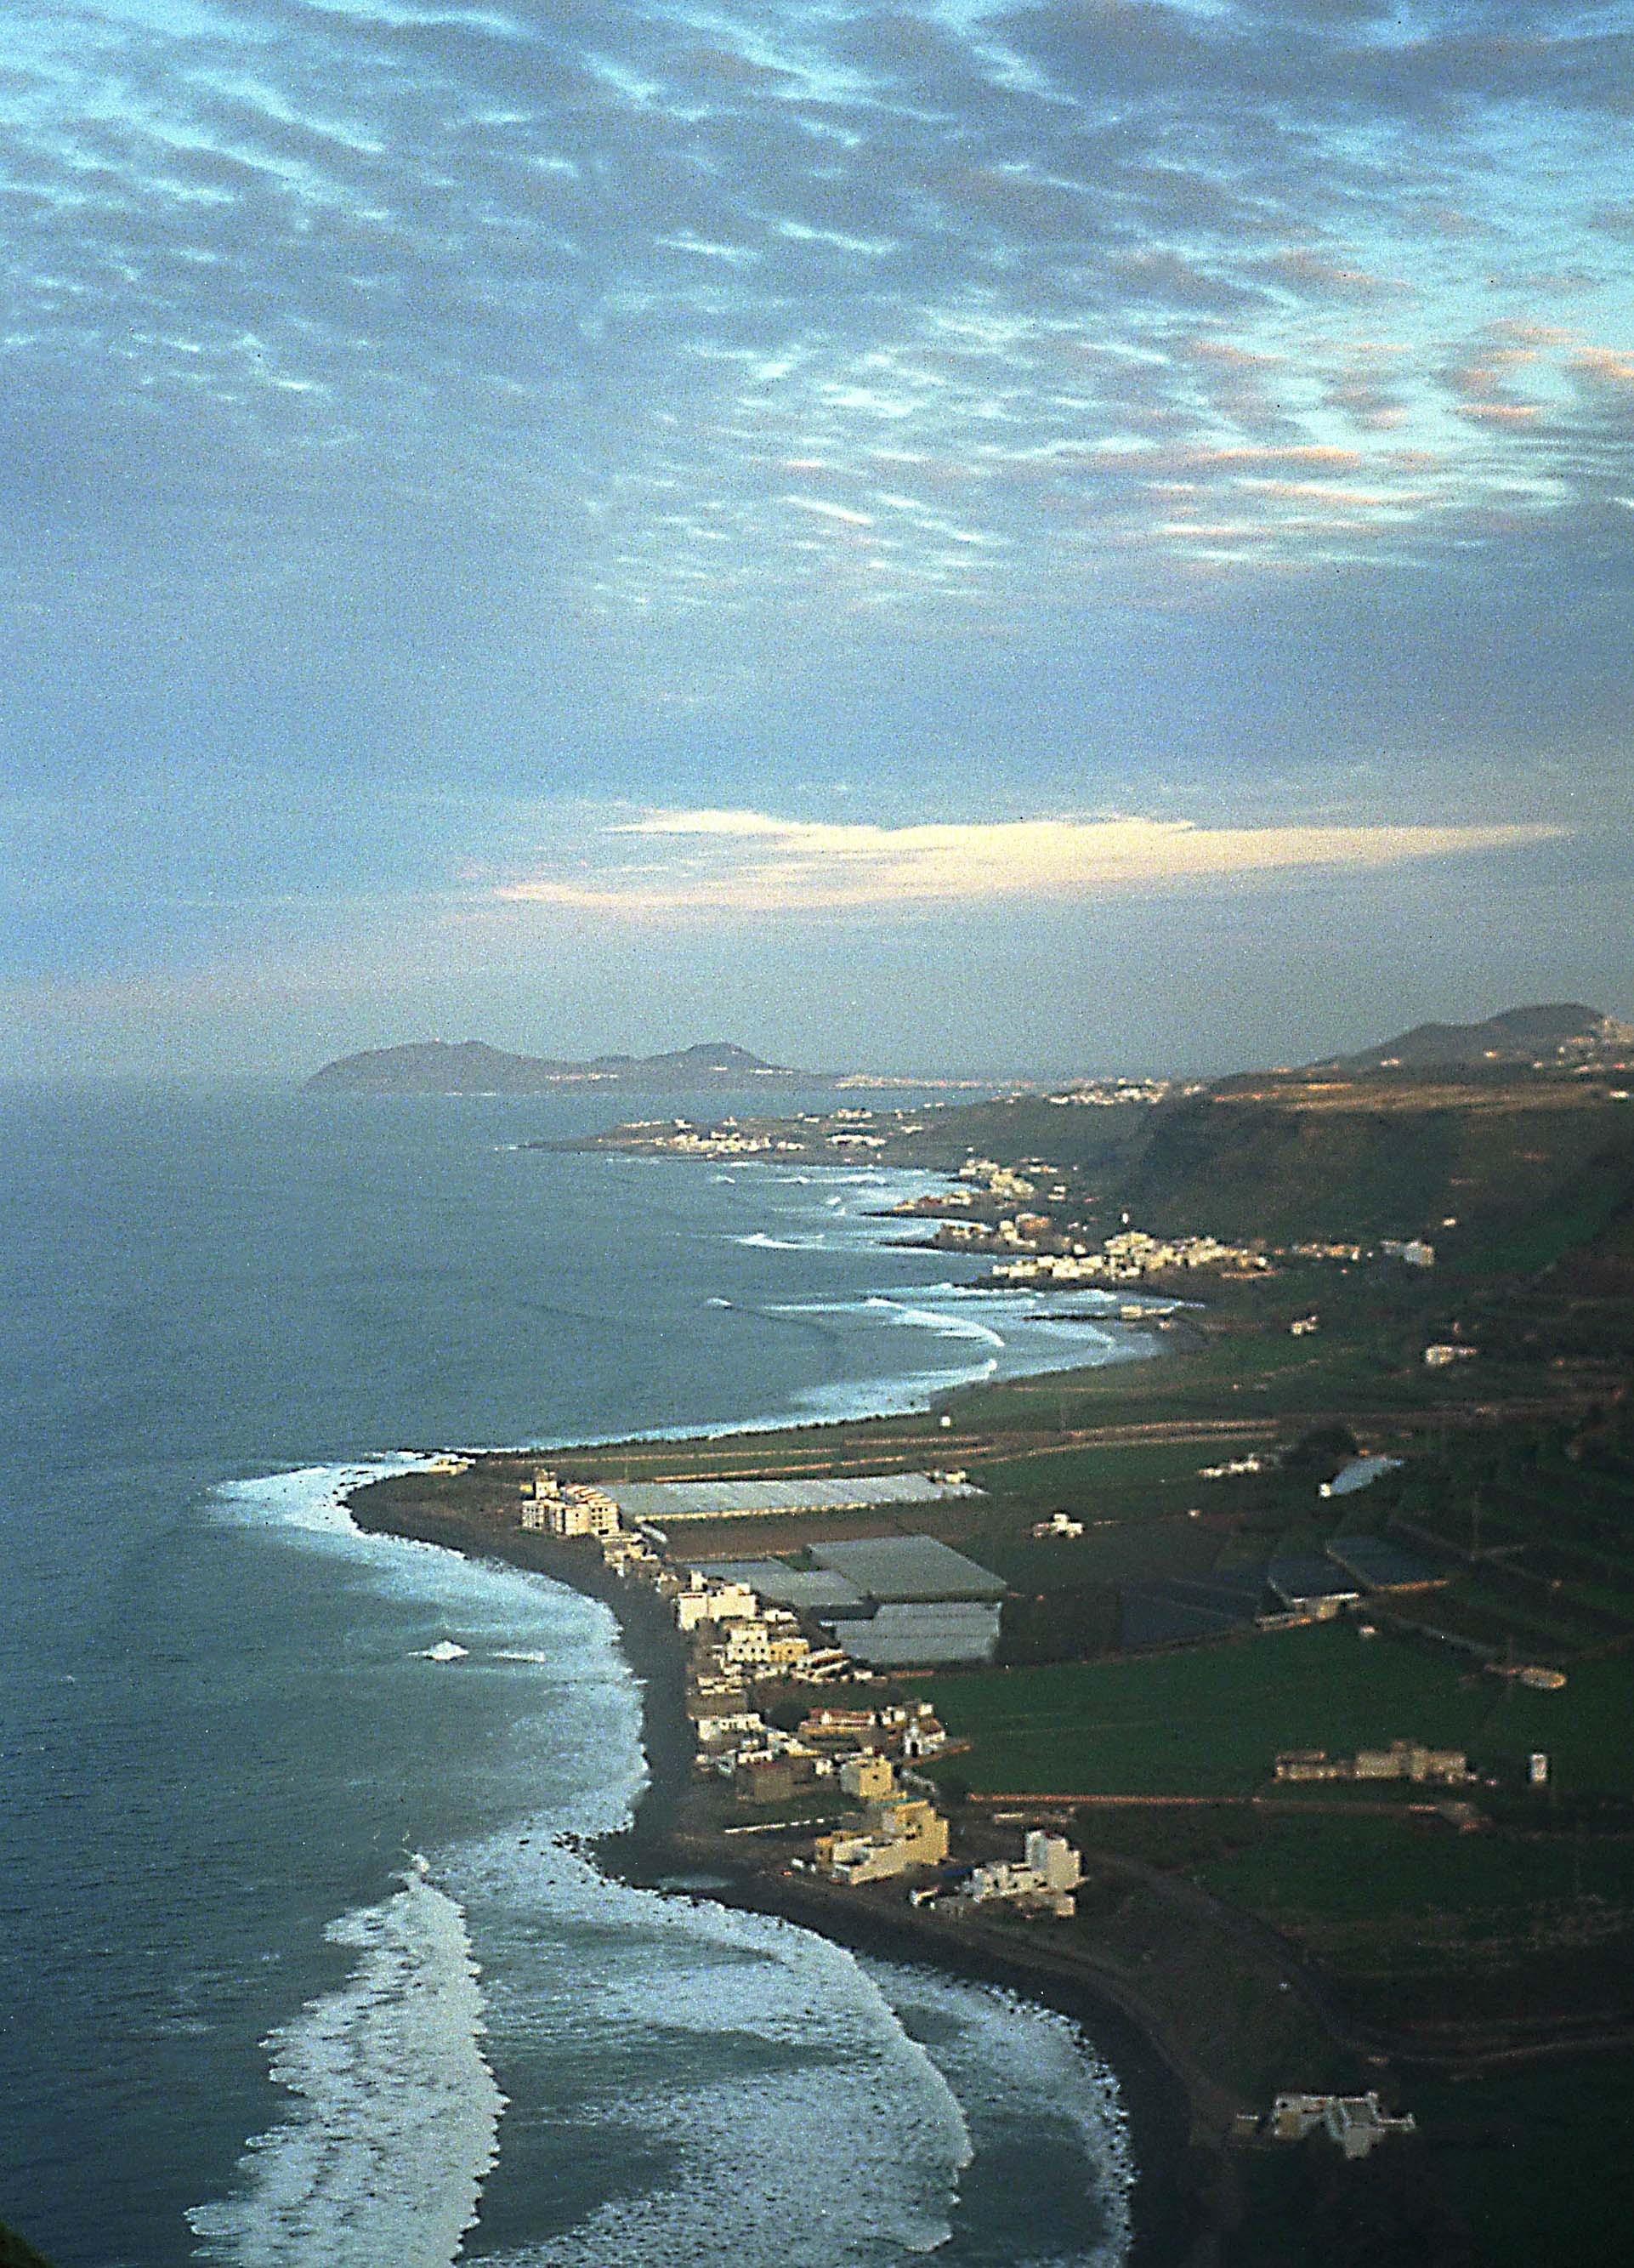 Santa Maria de Guia de Gran Canaria, Canary Islands, Spain